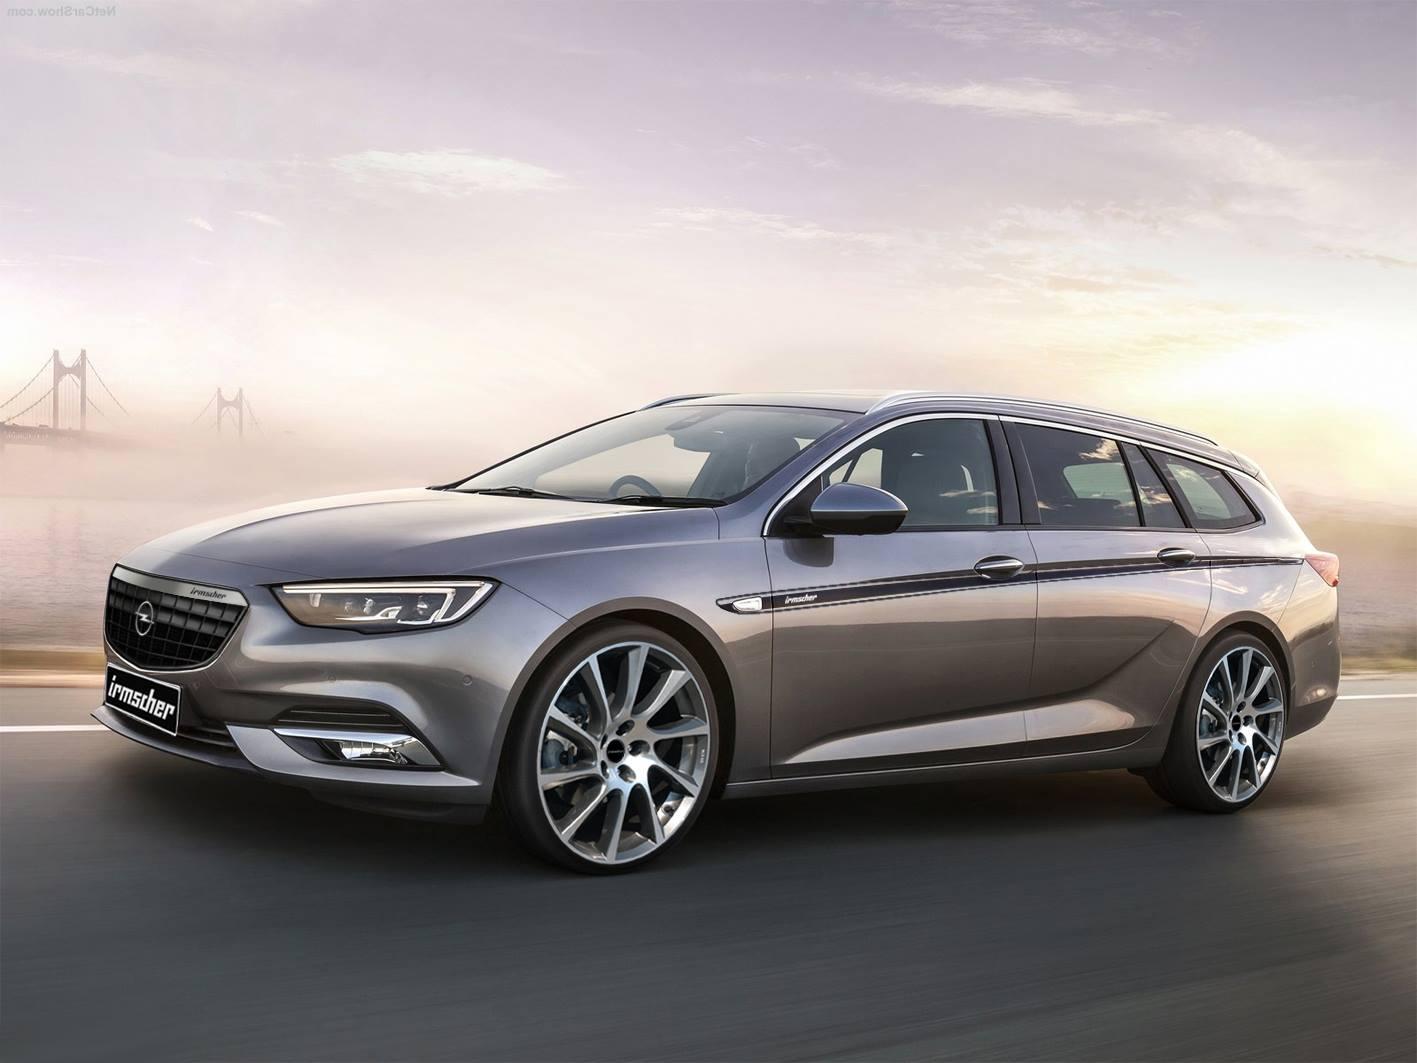 Irmscher Yeni Kasa Opel Insignia Jant